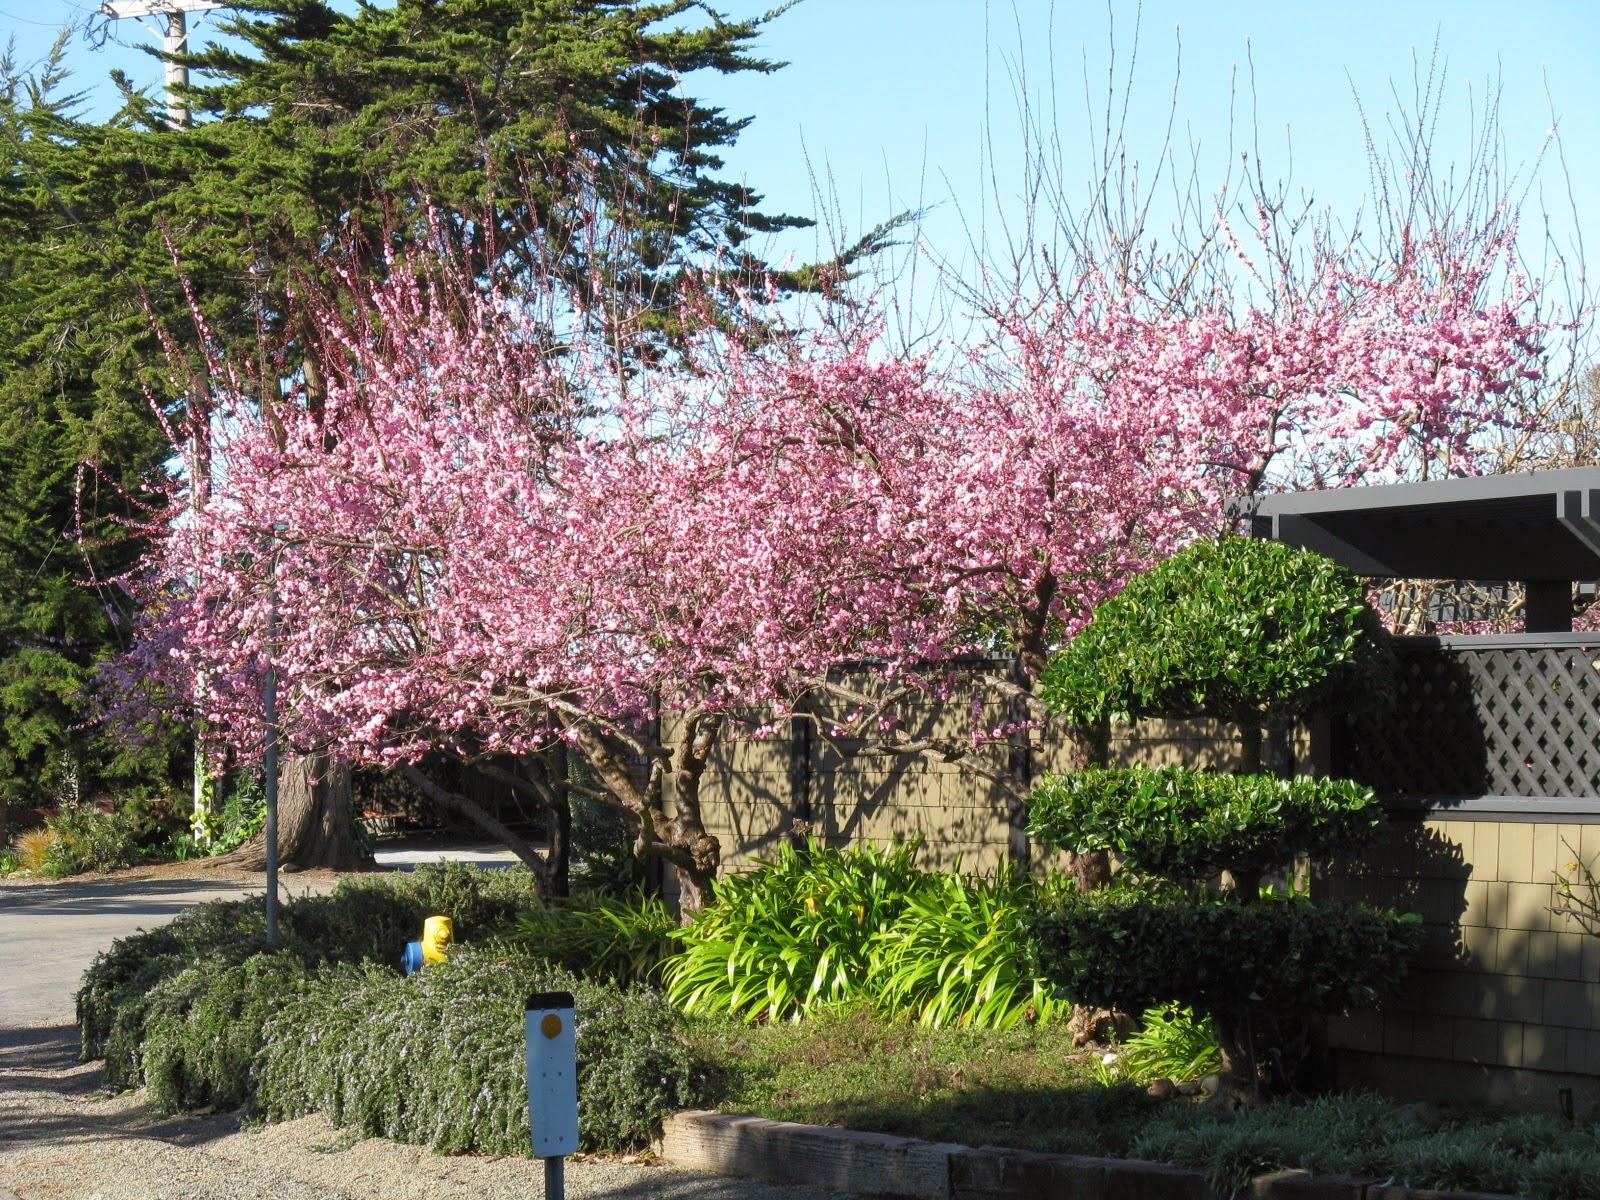 Trees of Santa Cruz County Prunus x Blireiana Blireiana Plum